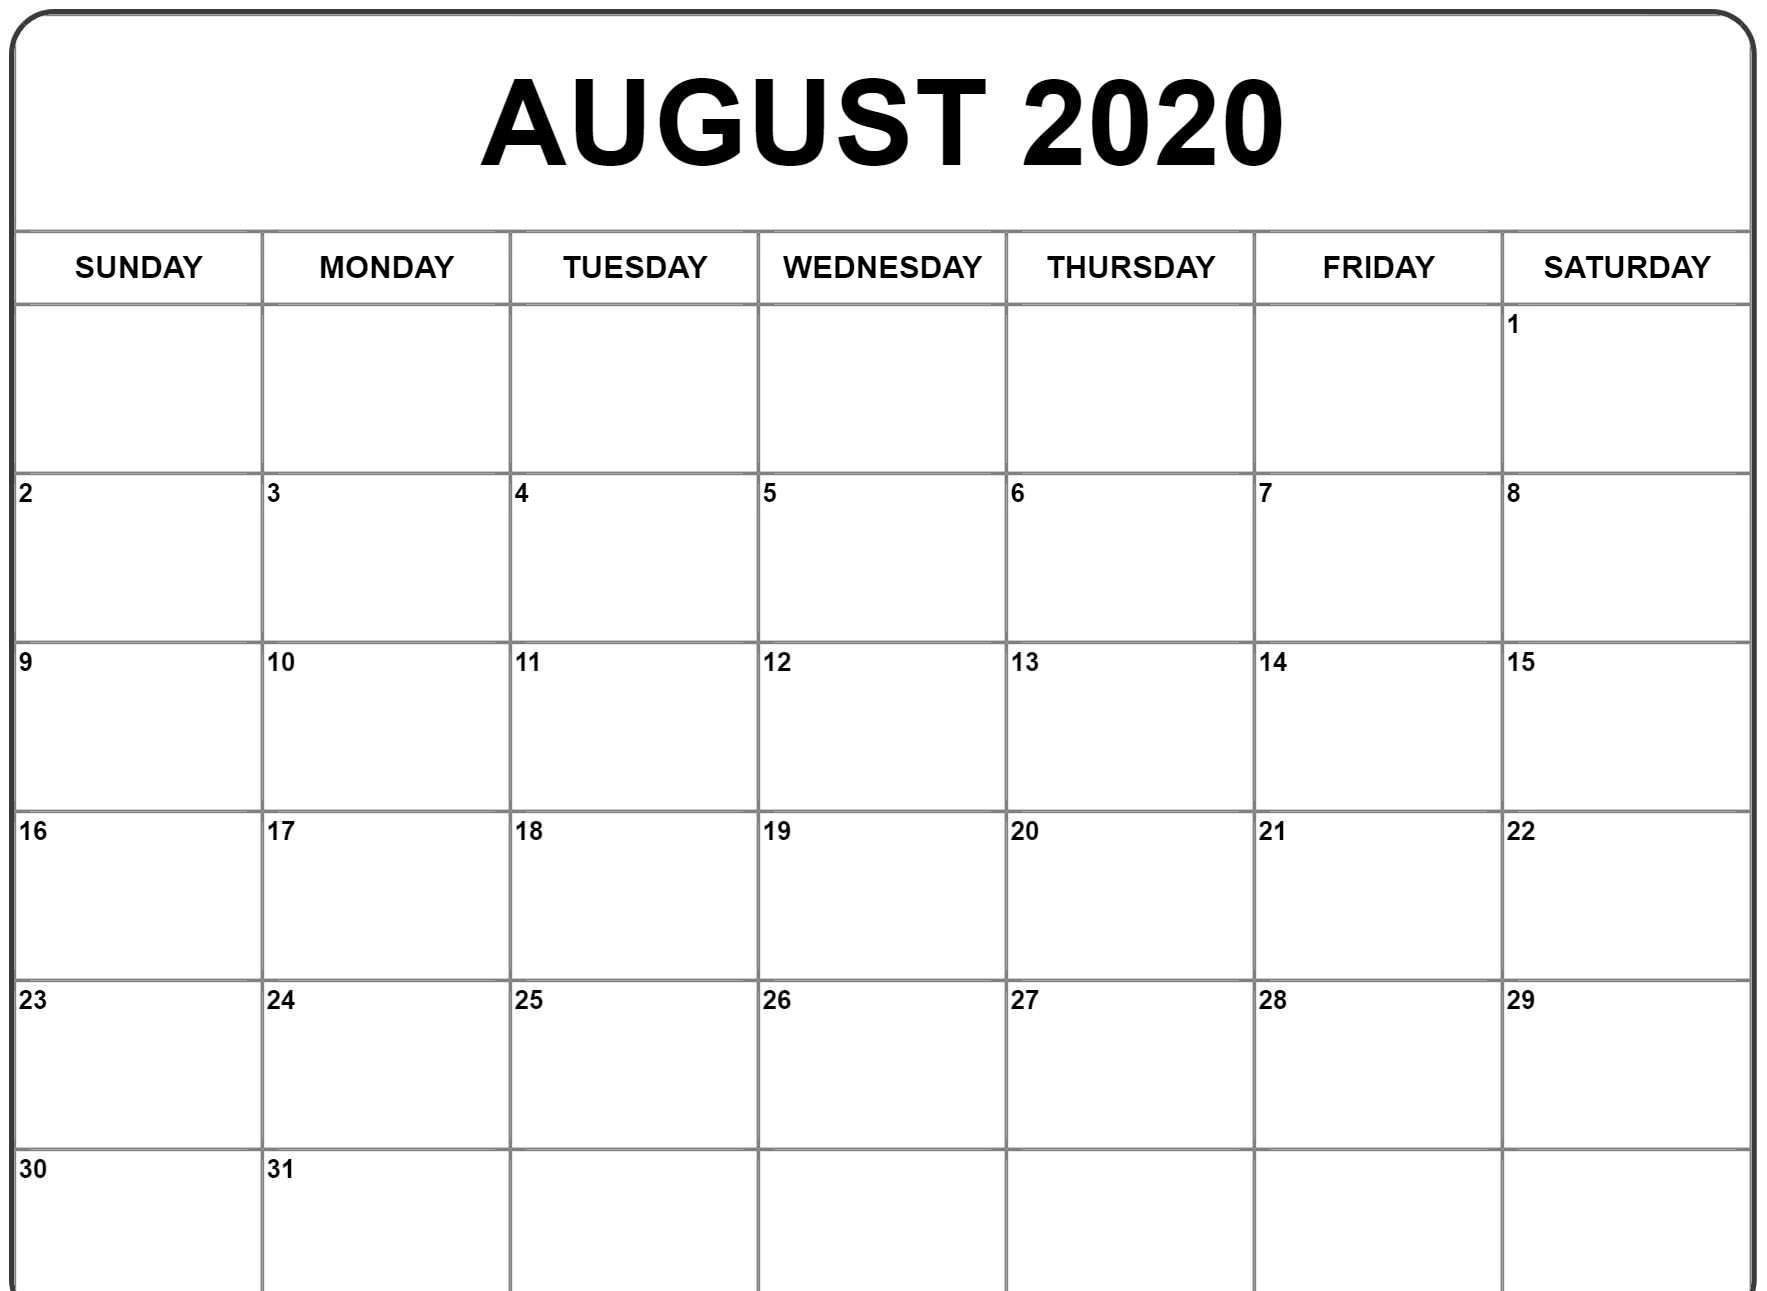 August 2020 Calendar Pdf, Word, Excel Printable Template-Printable January 2020 Calendar Word